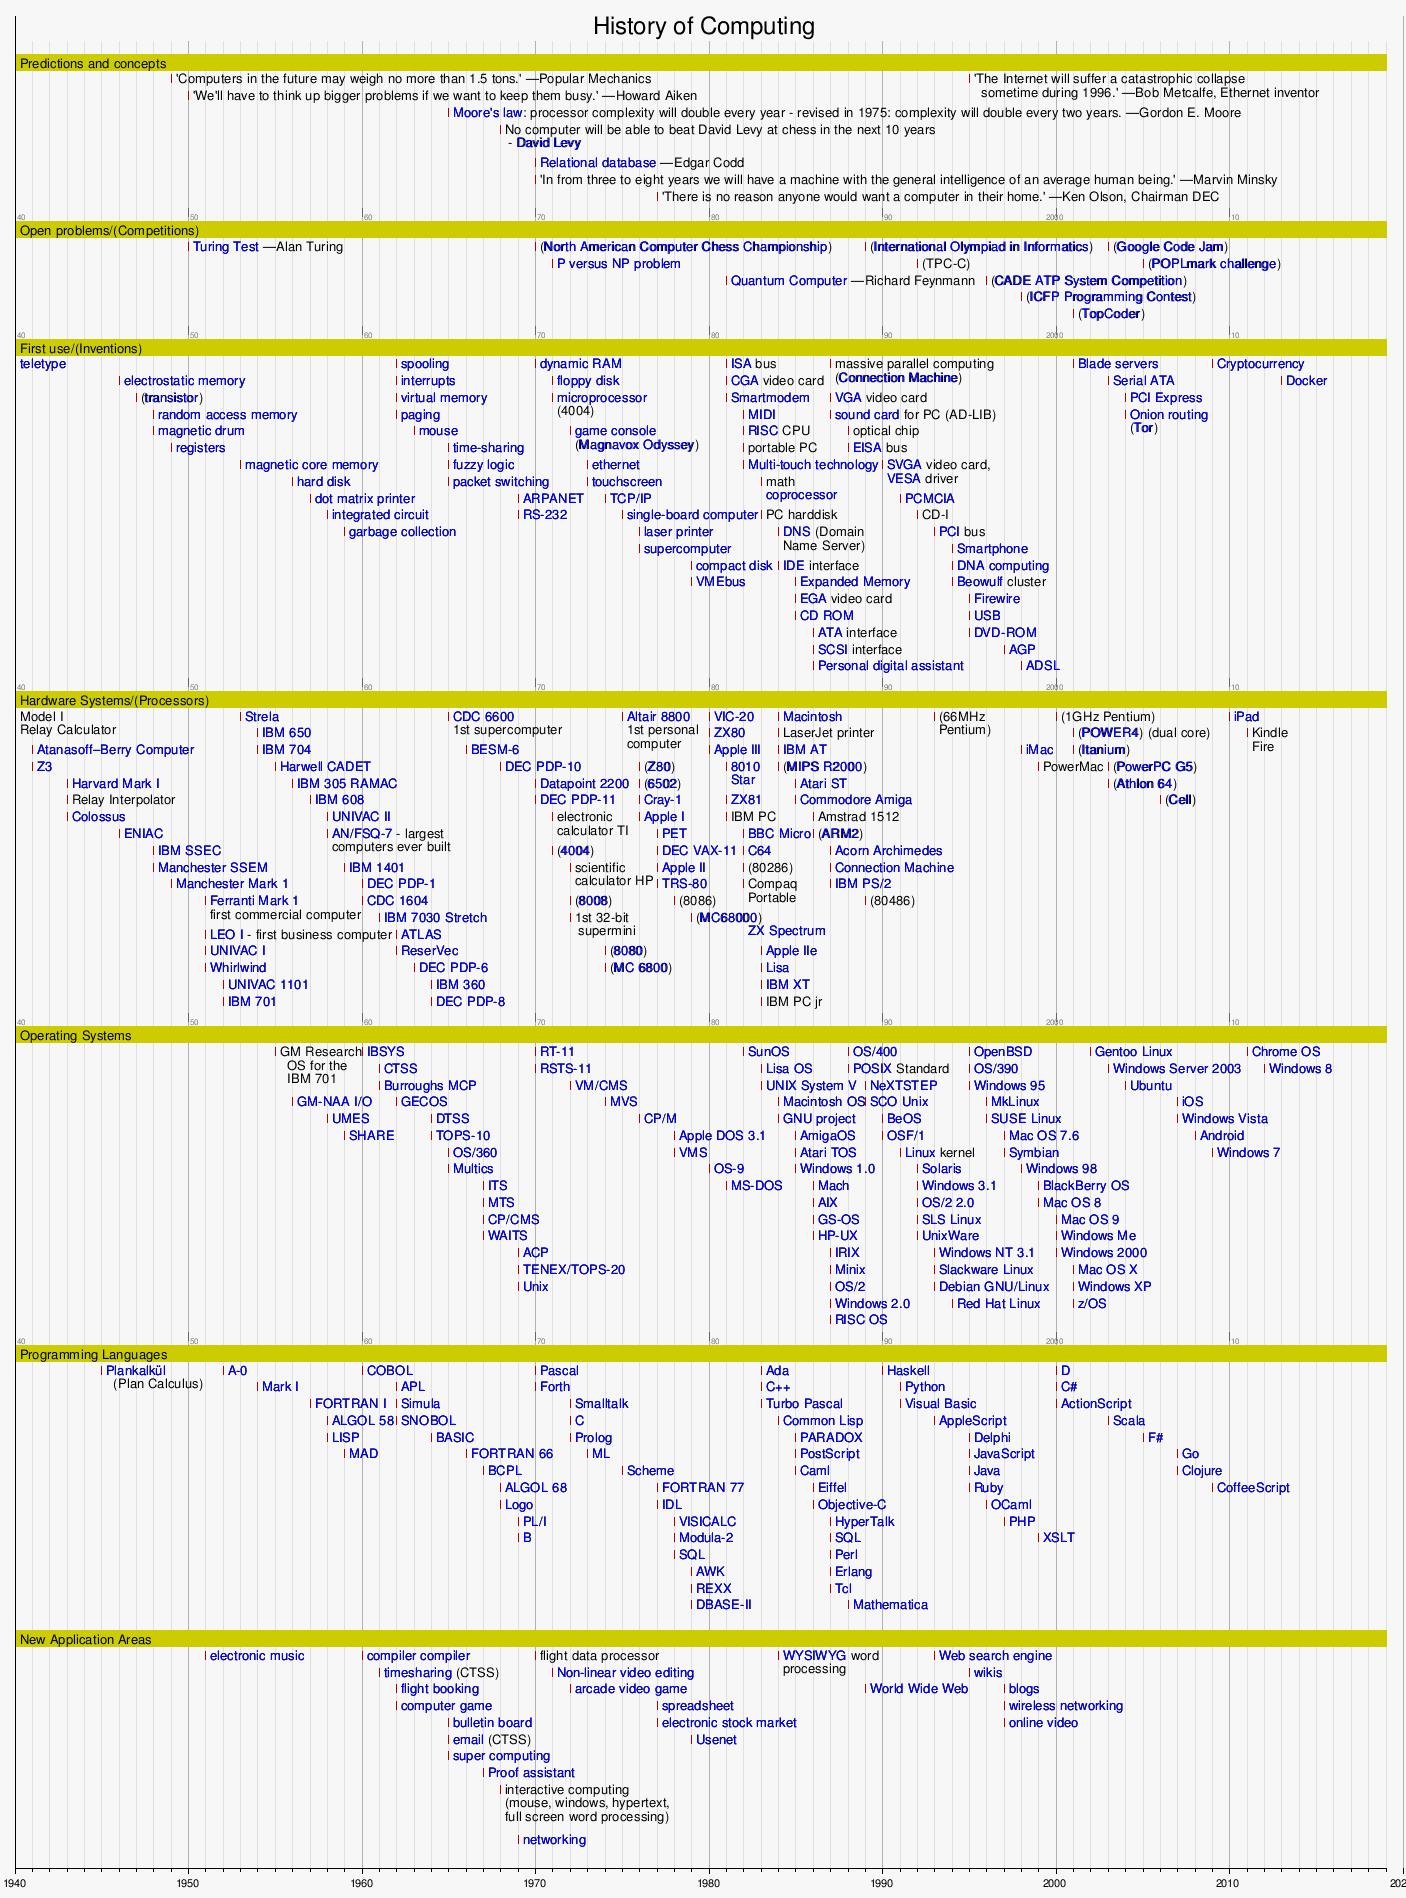 Timeline of computing - Wikipedia f73cb07a06f